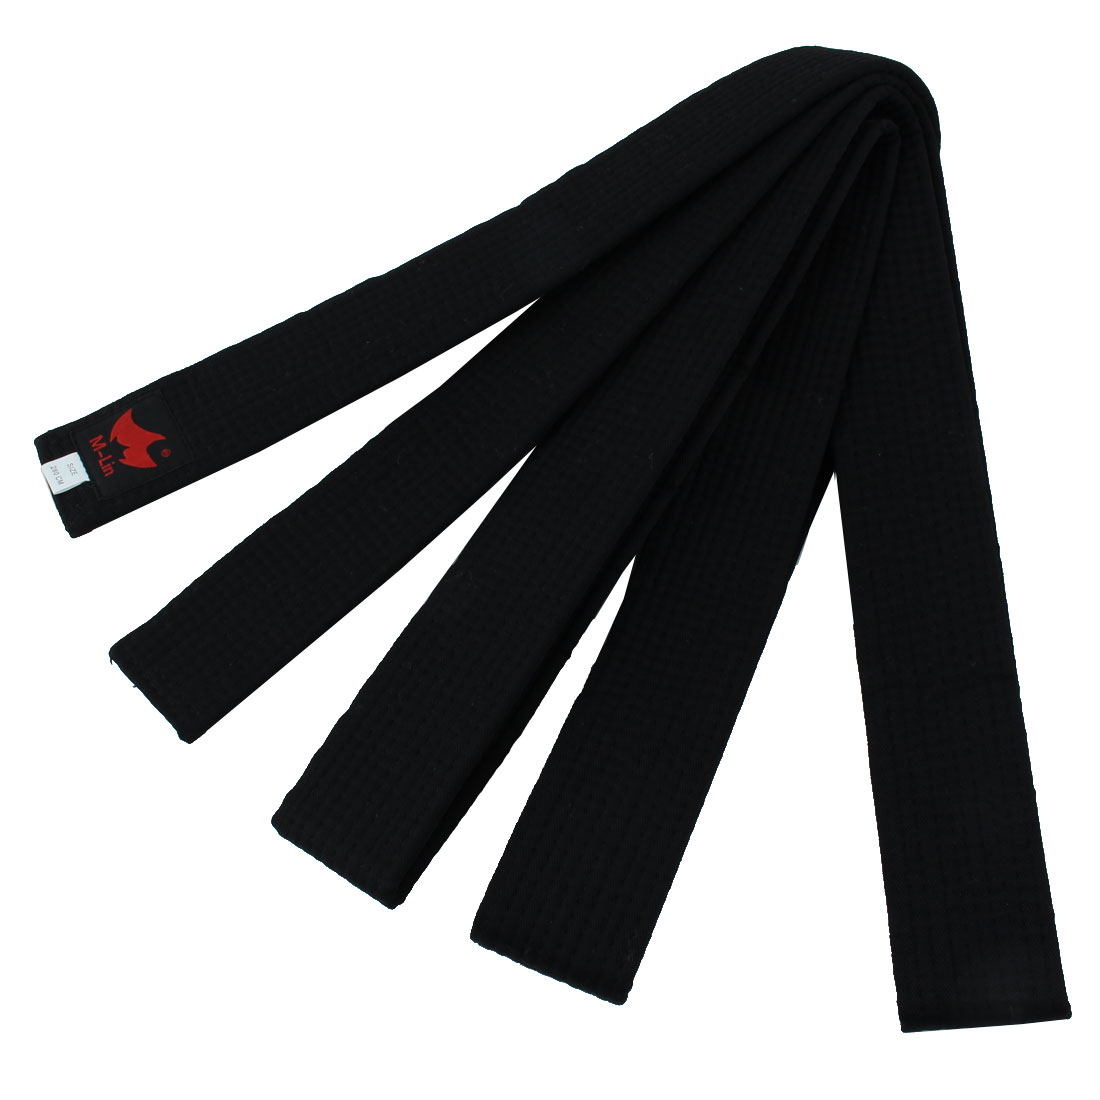 Judo Taekwondo Cotton Blend Uniform Belt Black 280cm Length